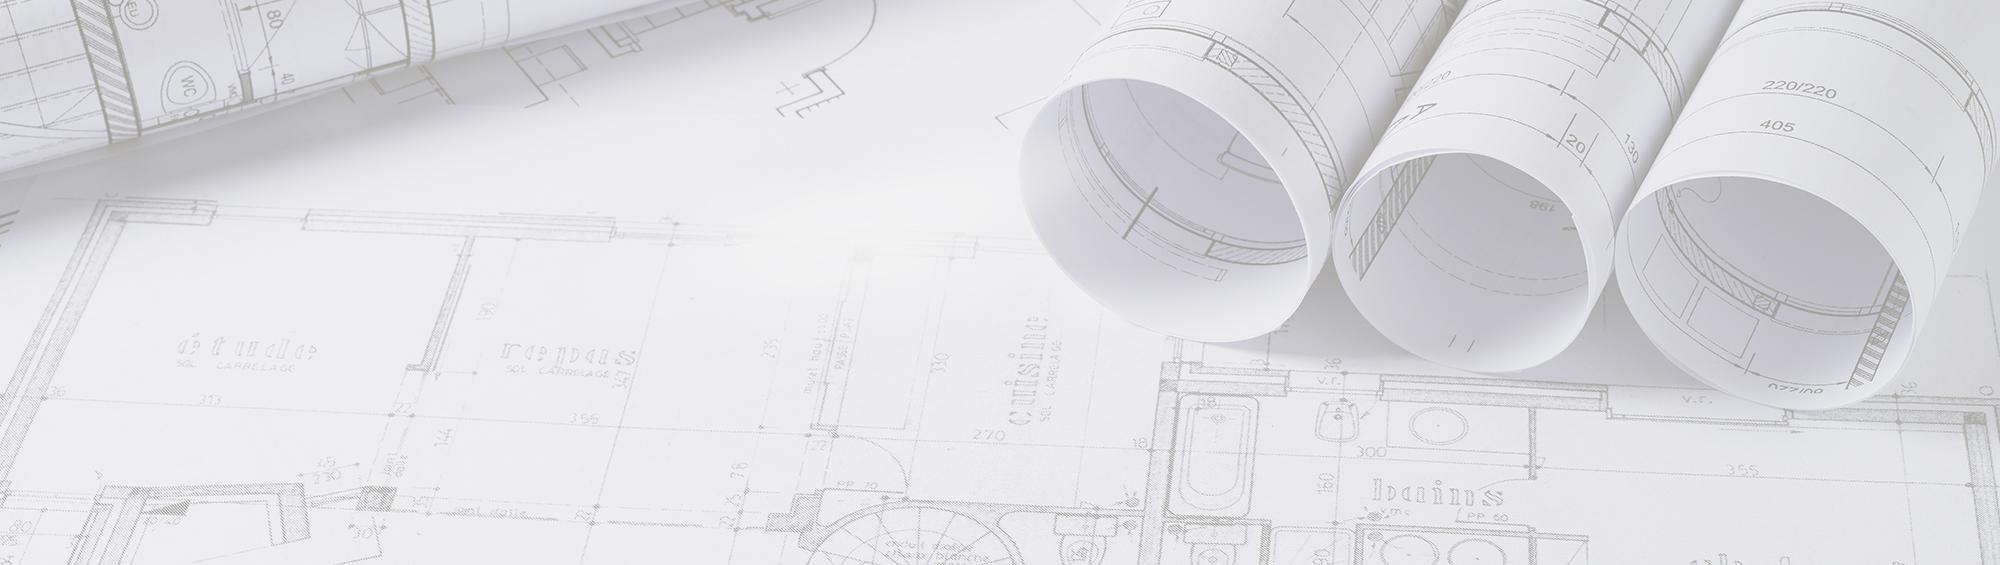 Diagnostic immobilier nancy 54000 adexi - Diagnostic electricite location ...